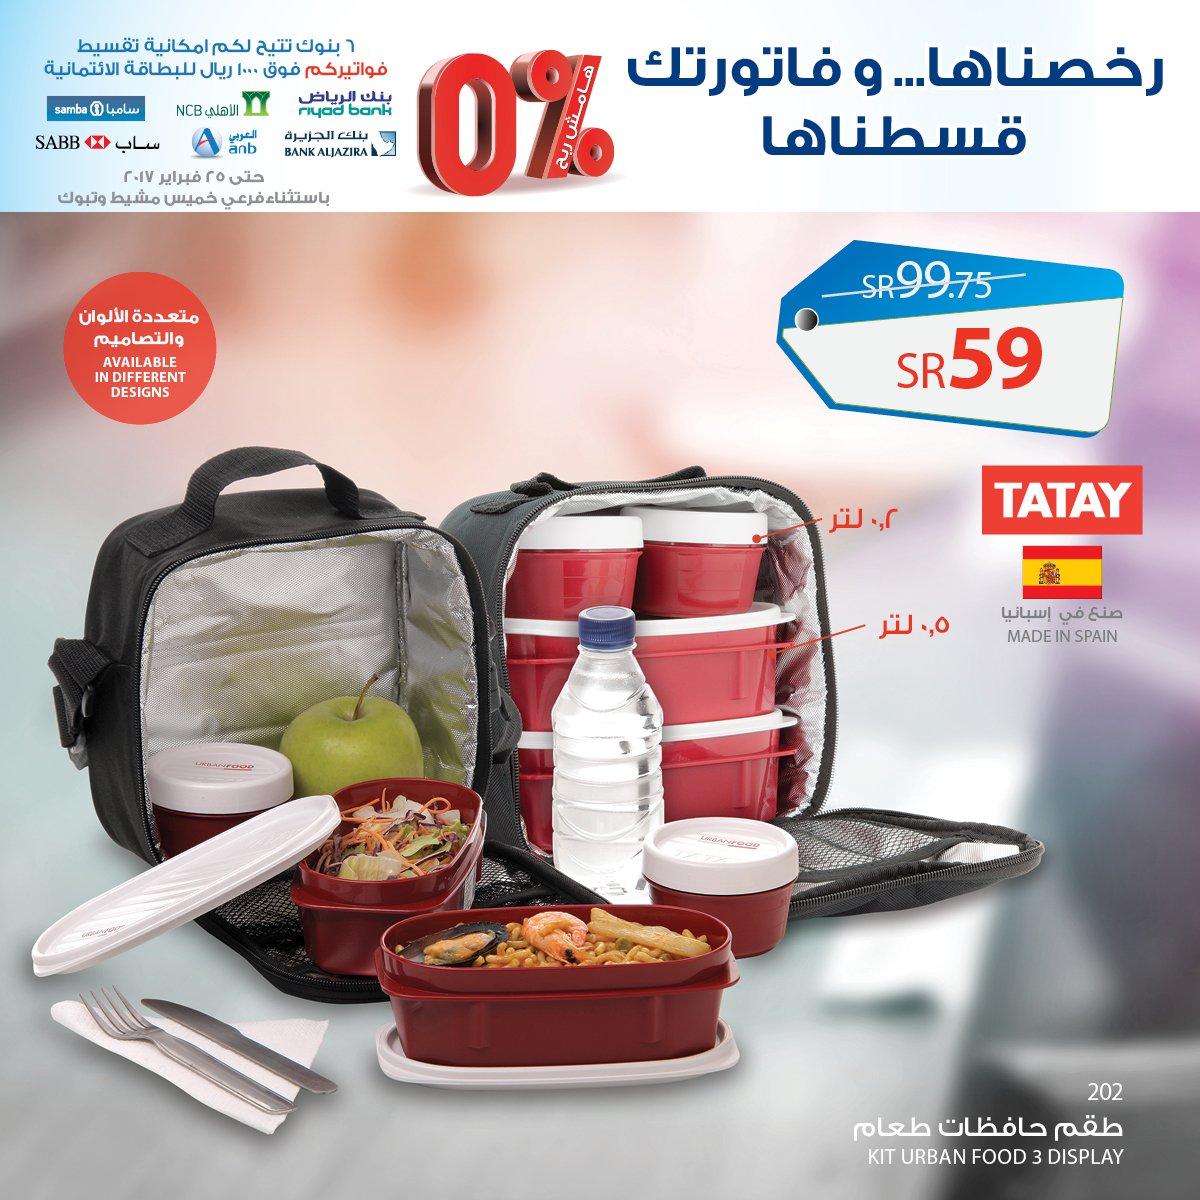 Saco ساكو No Twitter طقم حافظات للطعام الساخن والبارد مع حقيبة